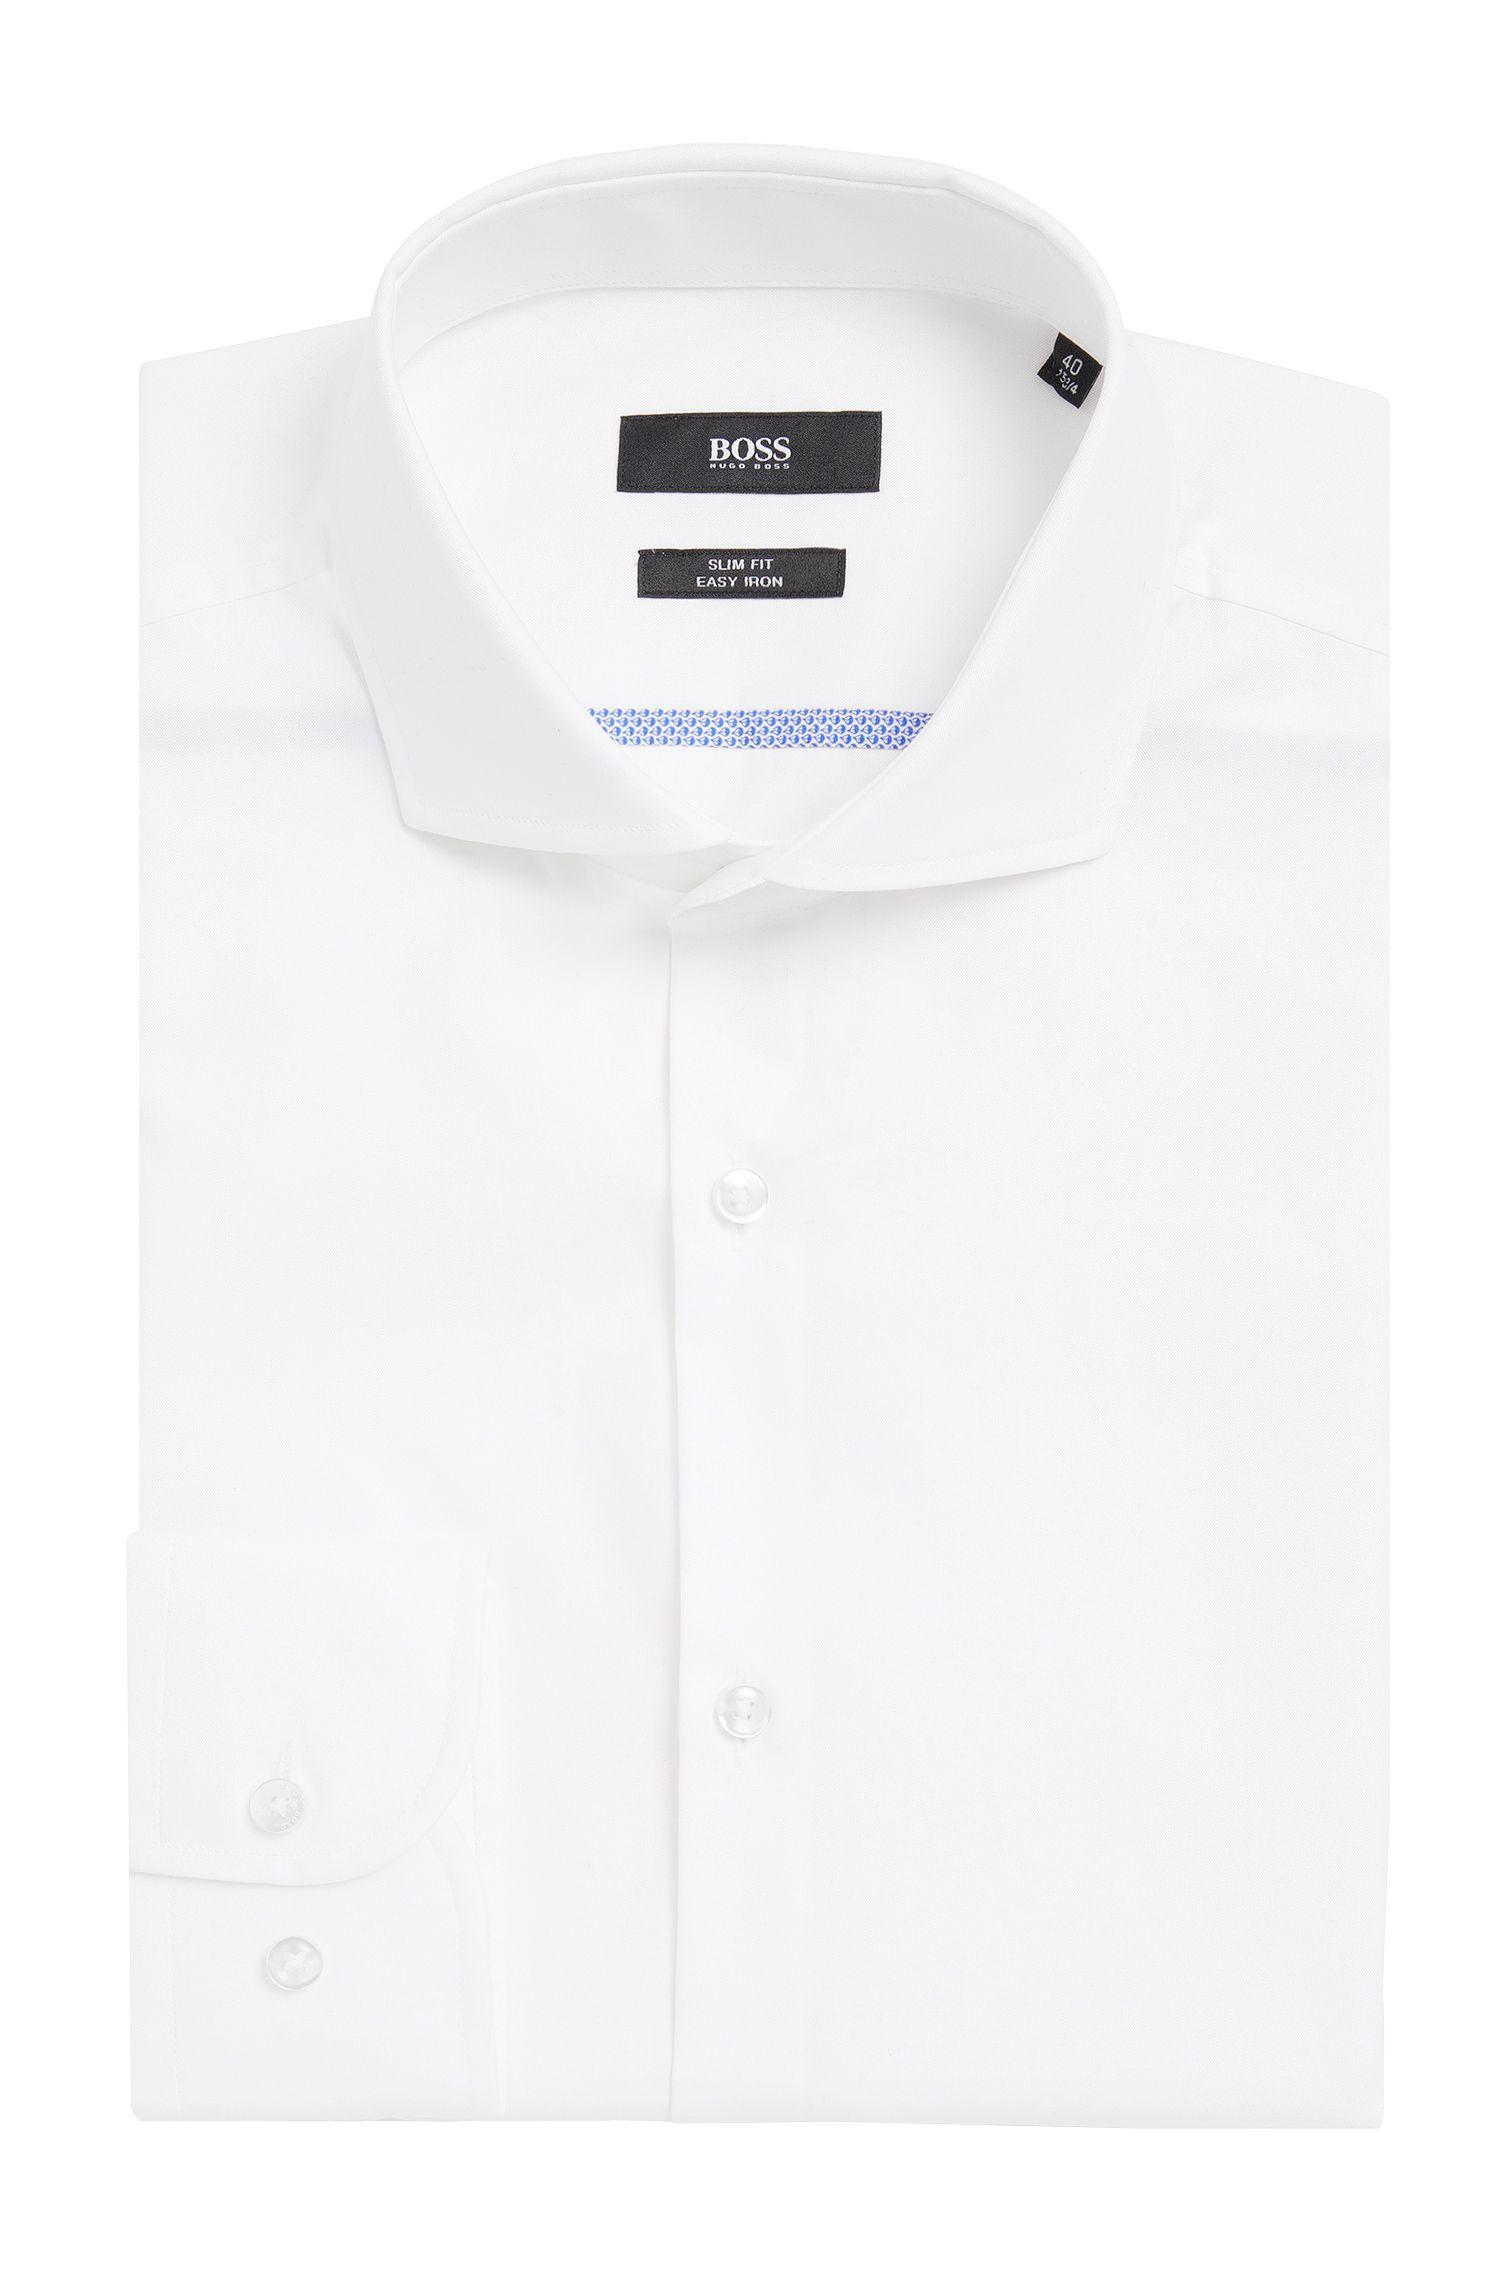 Easy Iron Italian Cotton Dress Shirt, Slim Fit   Jerrin, White